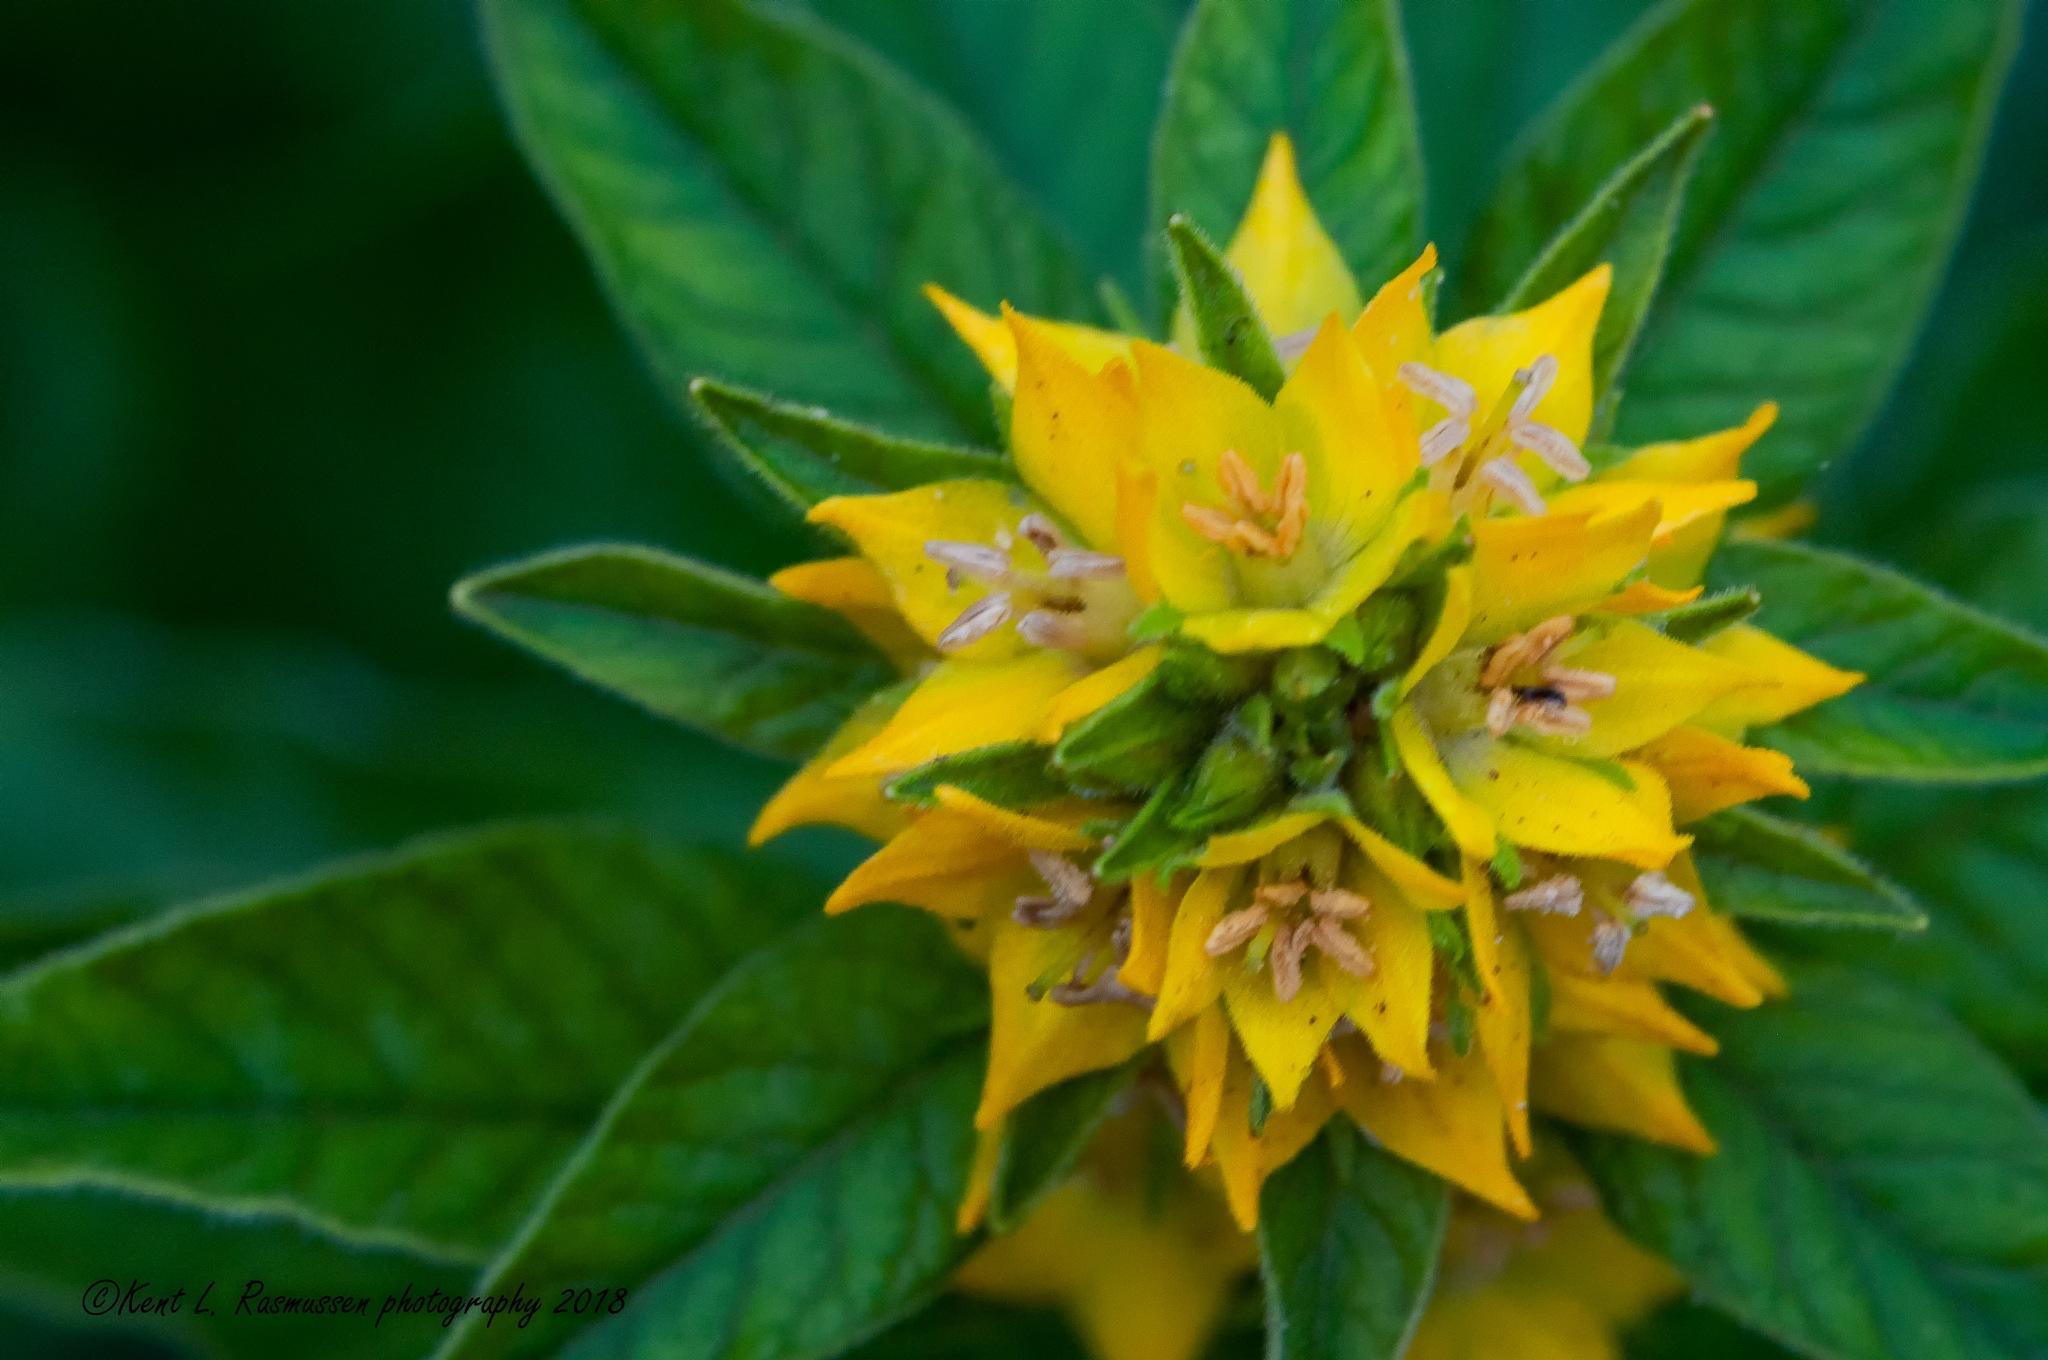 Yellow & green  by Kent L. Rasmussen